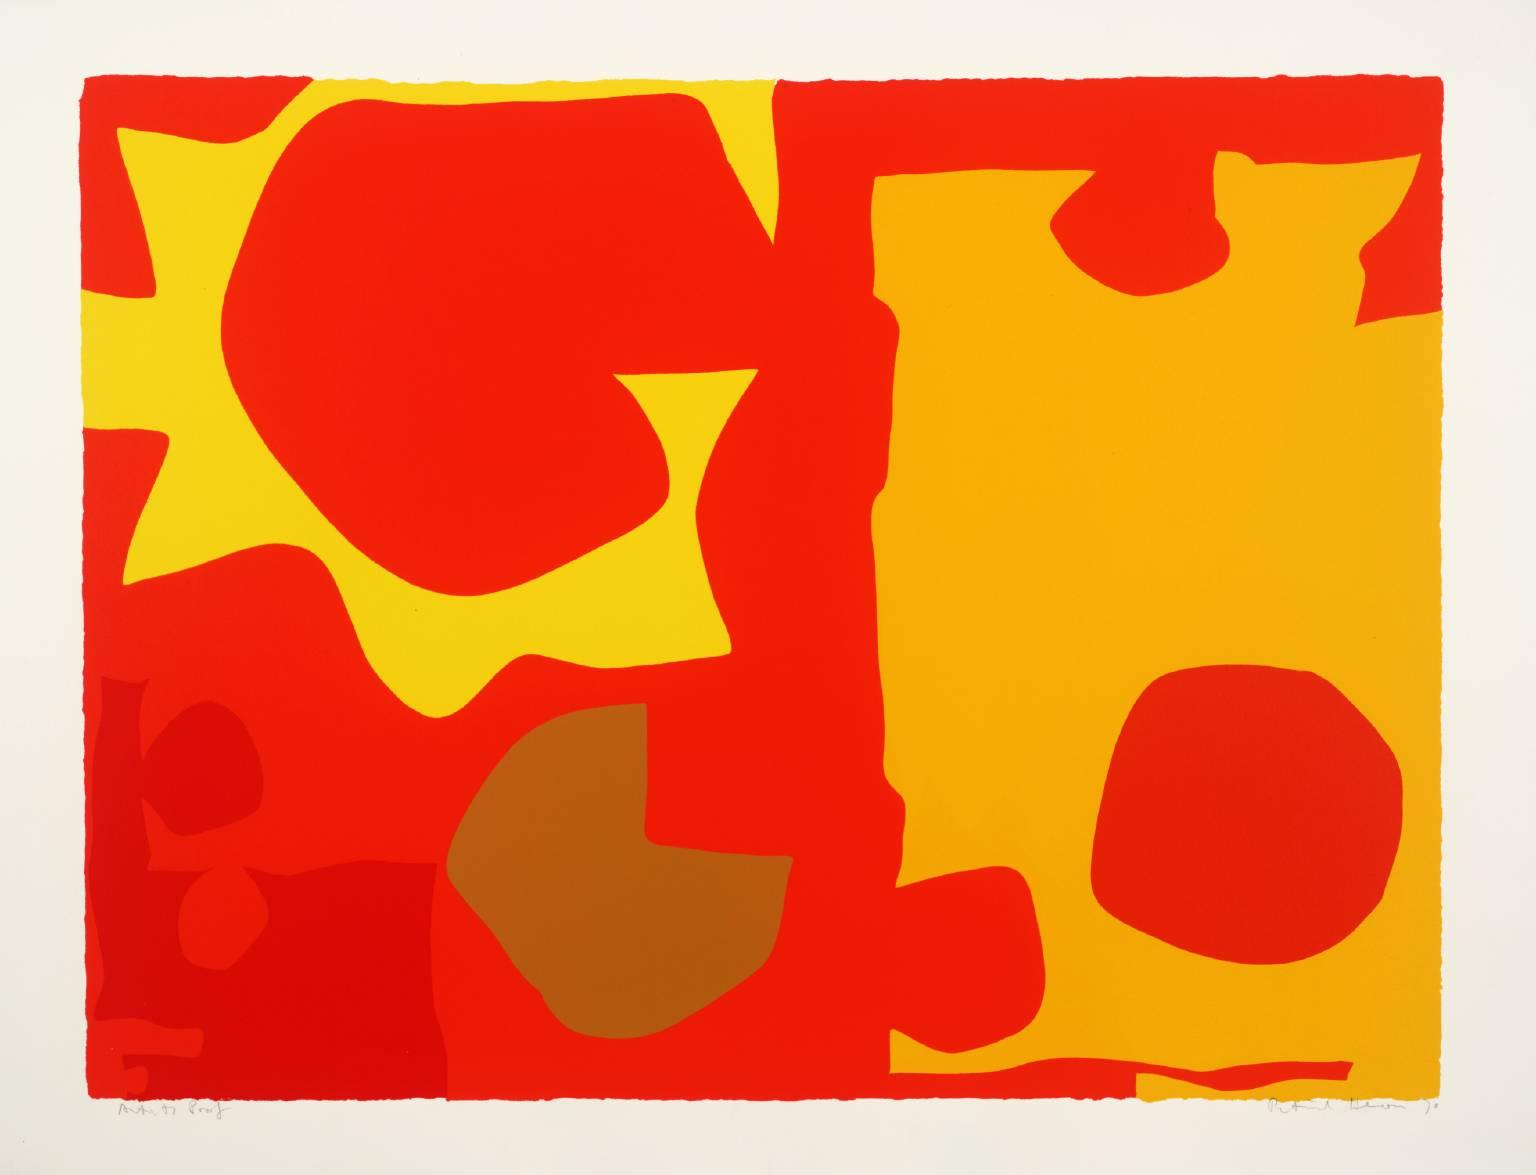 Patrick Heron Six in Light Orange with Red in Yellow Patrick Heron